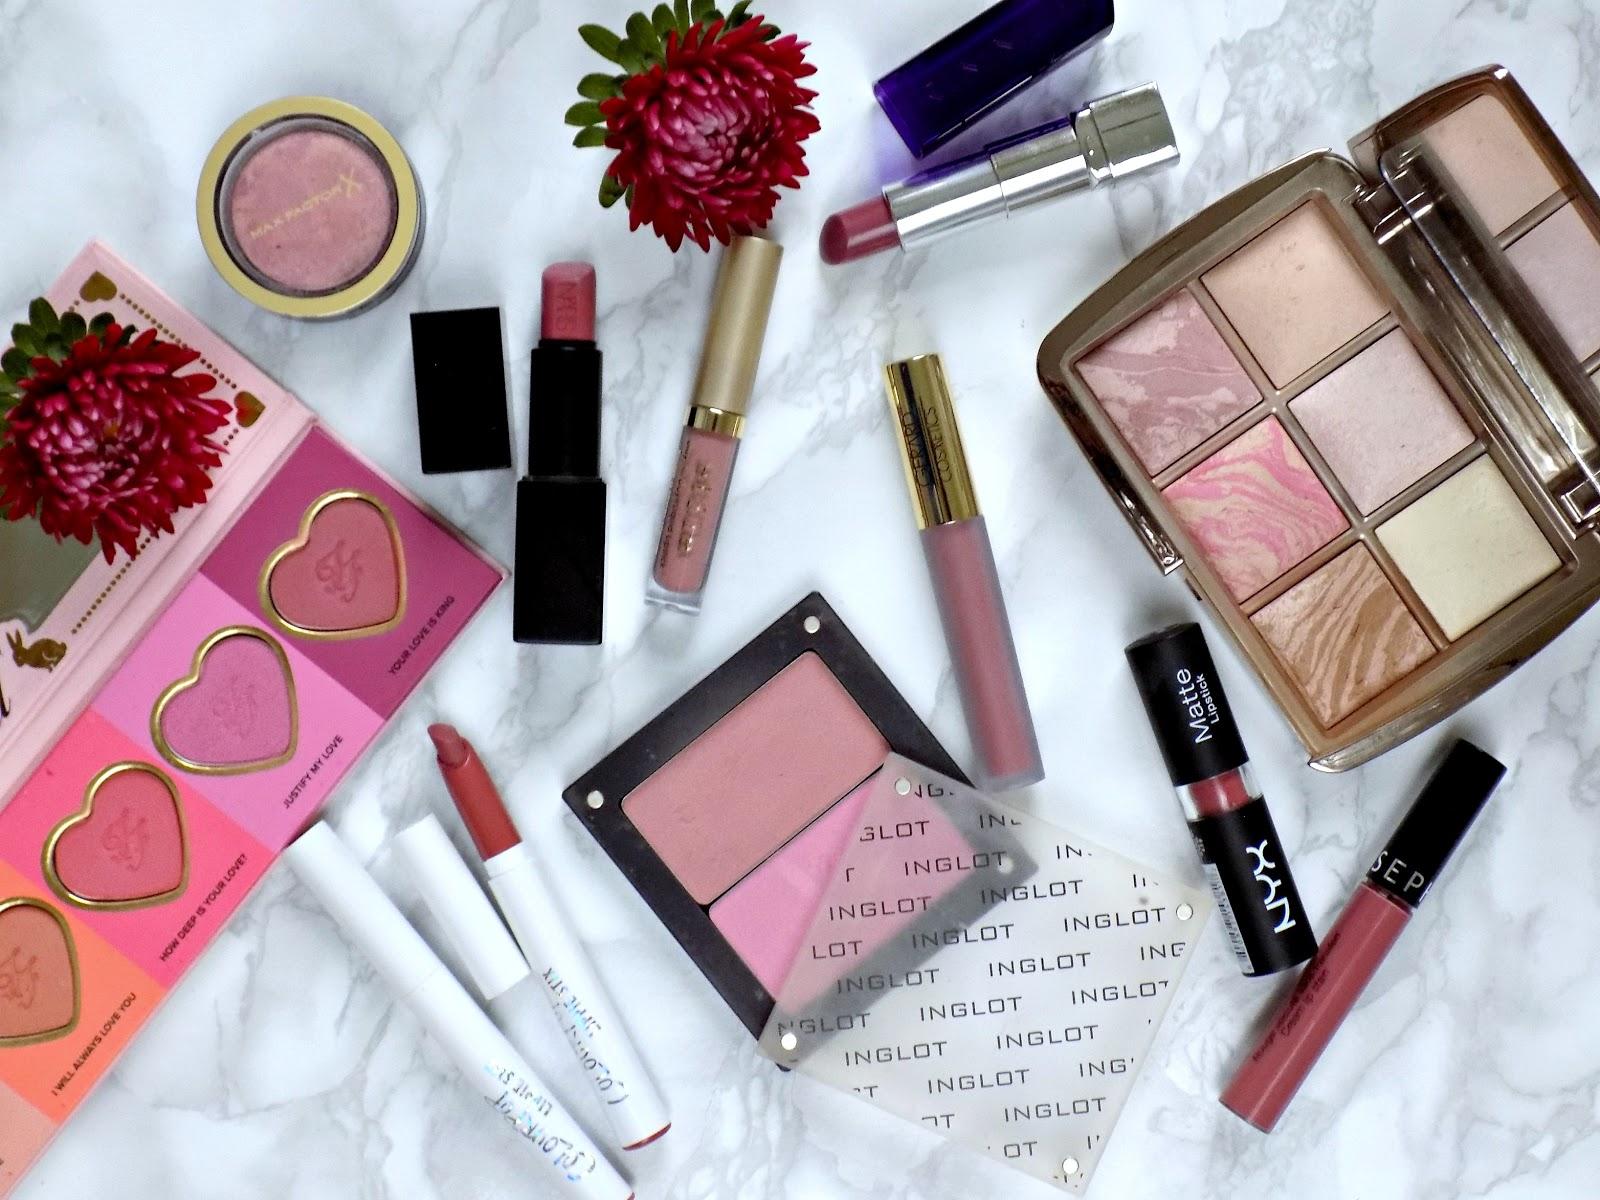 Mauve lipsticks and blushes for Autumn